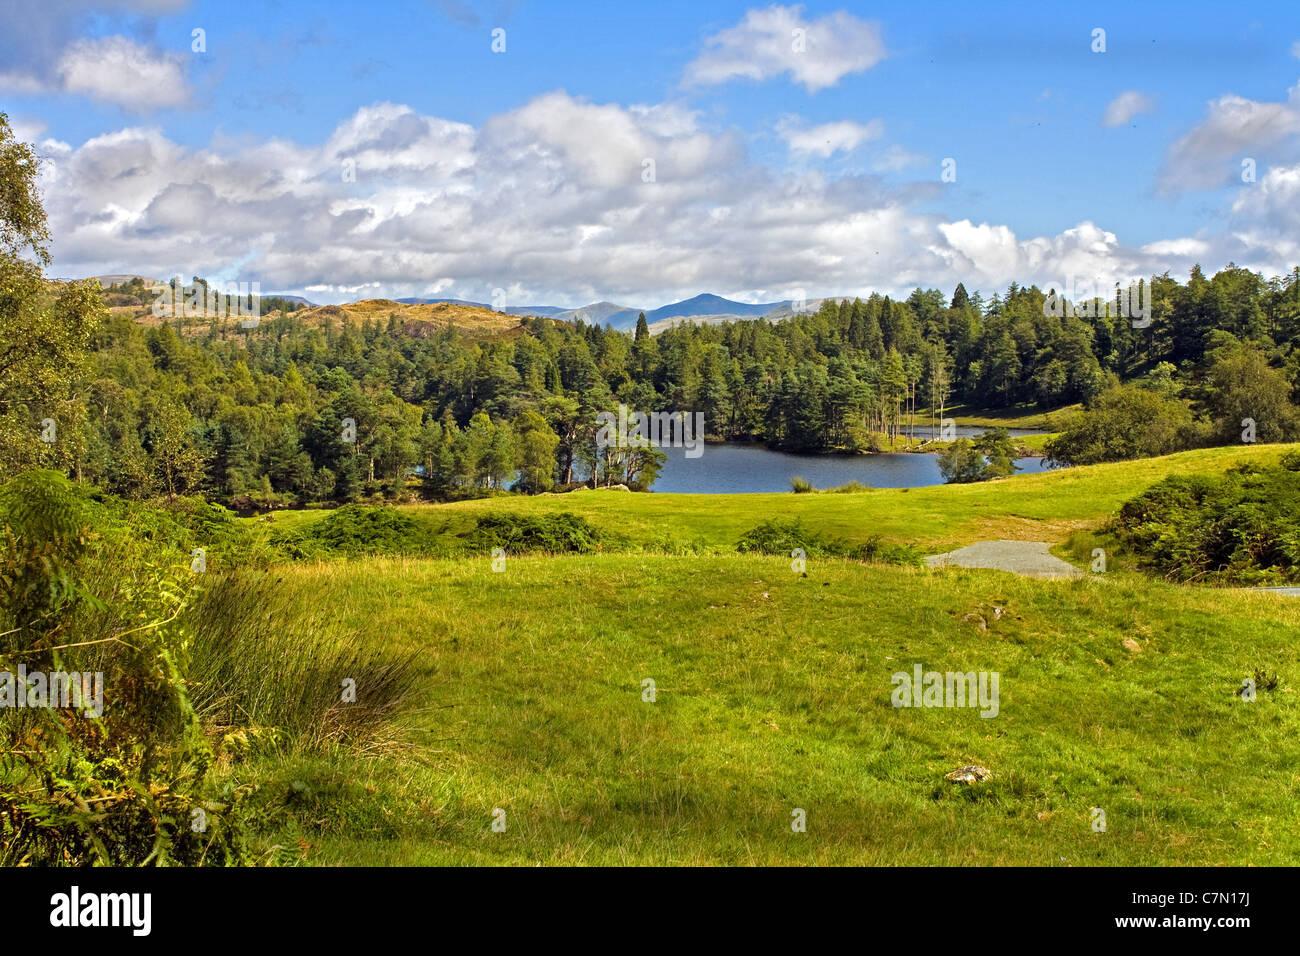 Landscape shot of Tarn Howes Lake, near Keswick in the Lake District - Stock Image